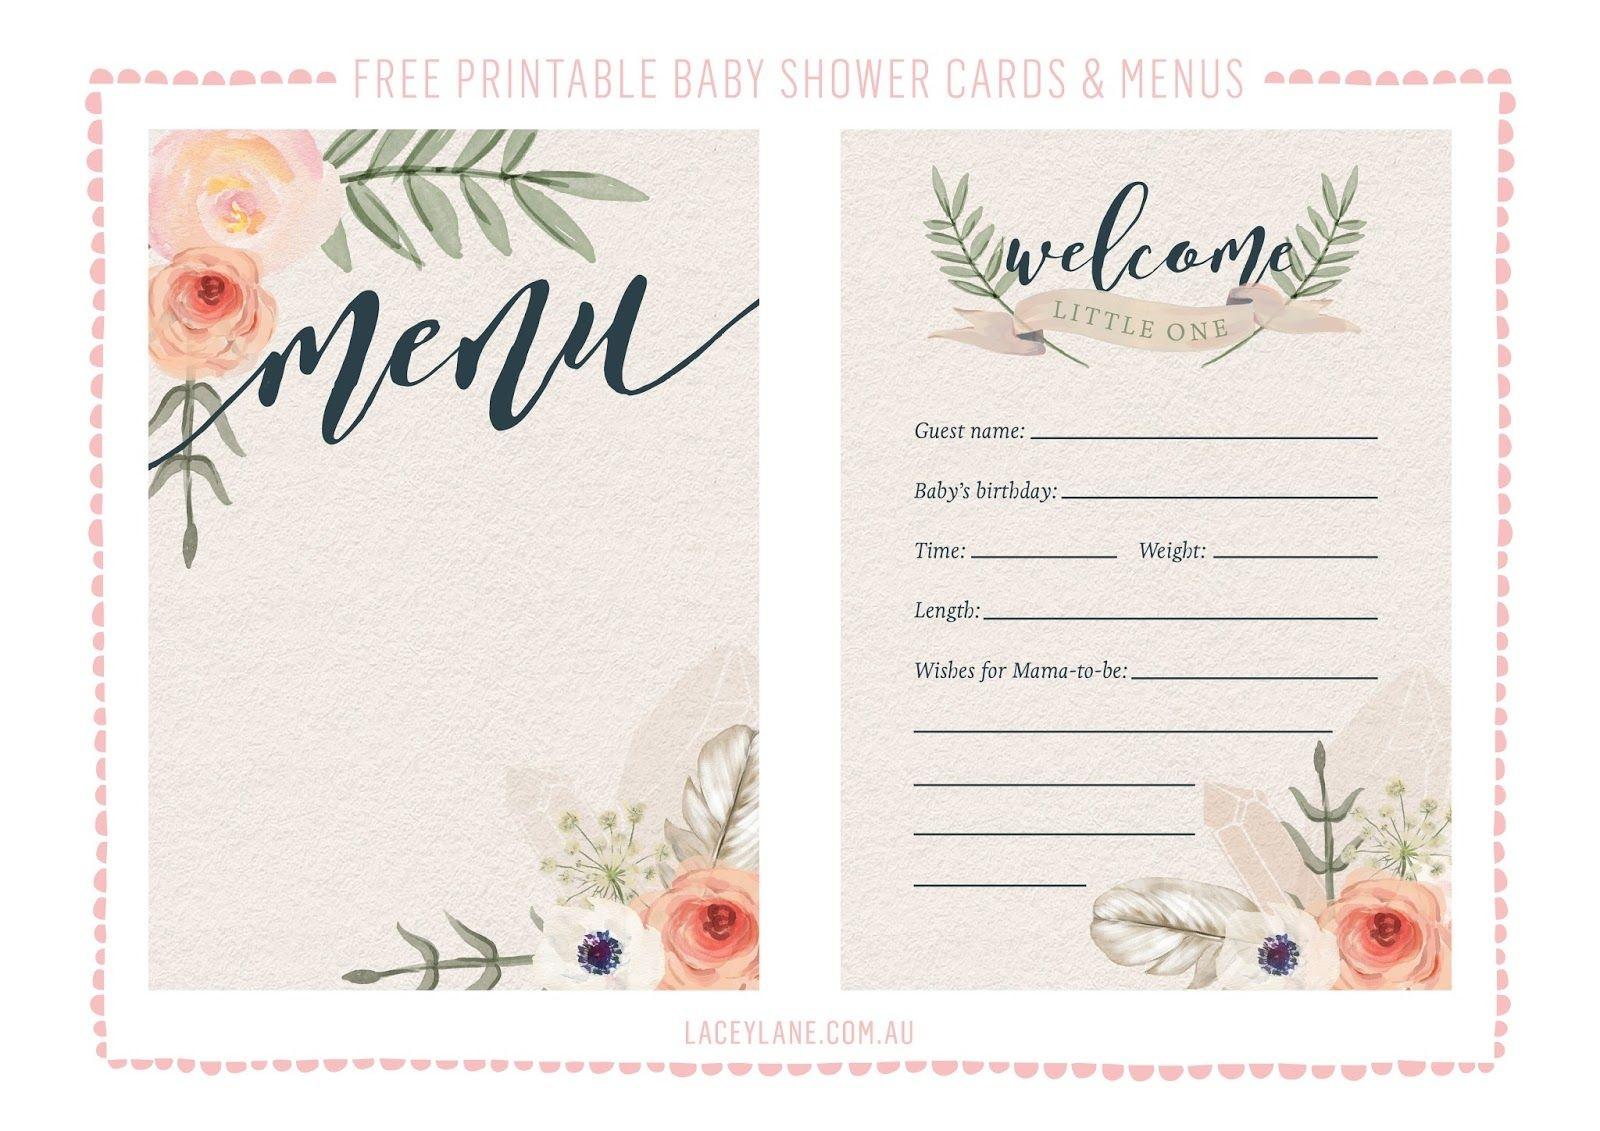 Free Printables ♥ Vintage Boho Baby Shower Cards   Lm Baby Shower - Free Boho Baby Shower Printables